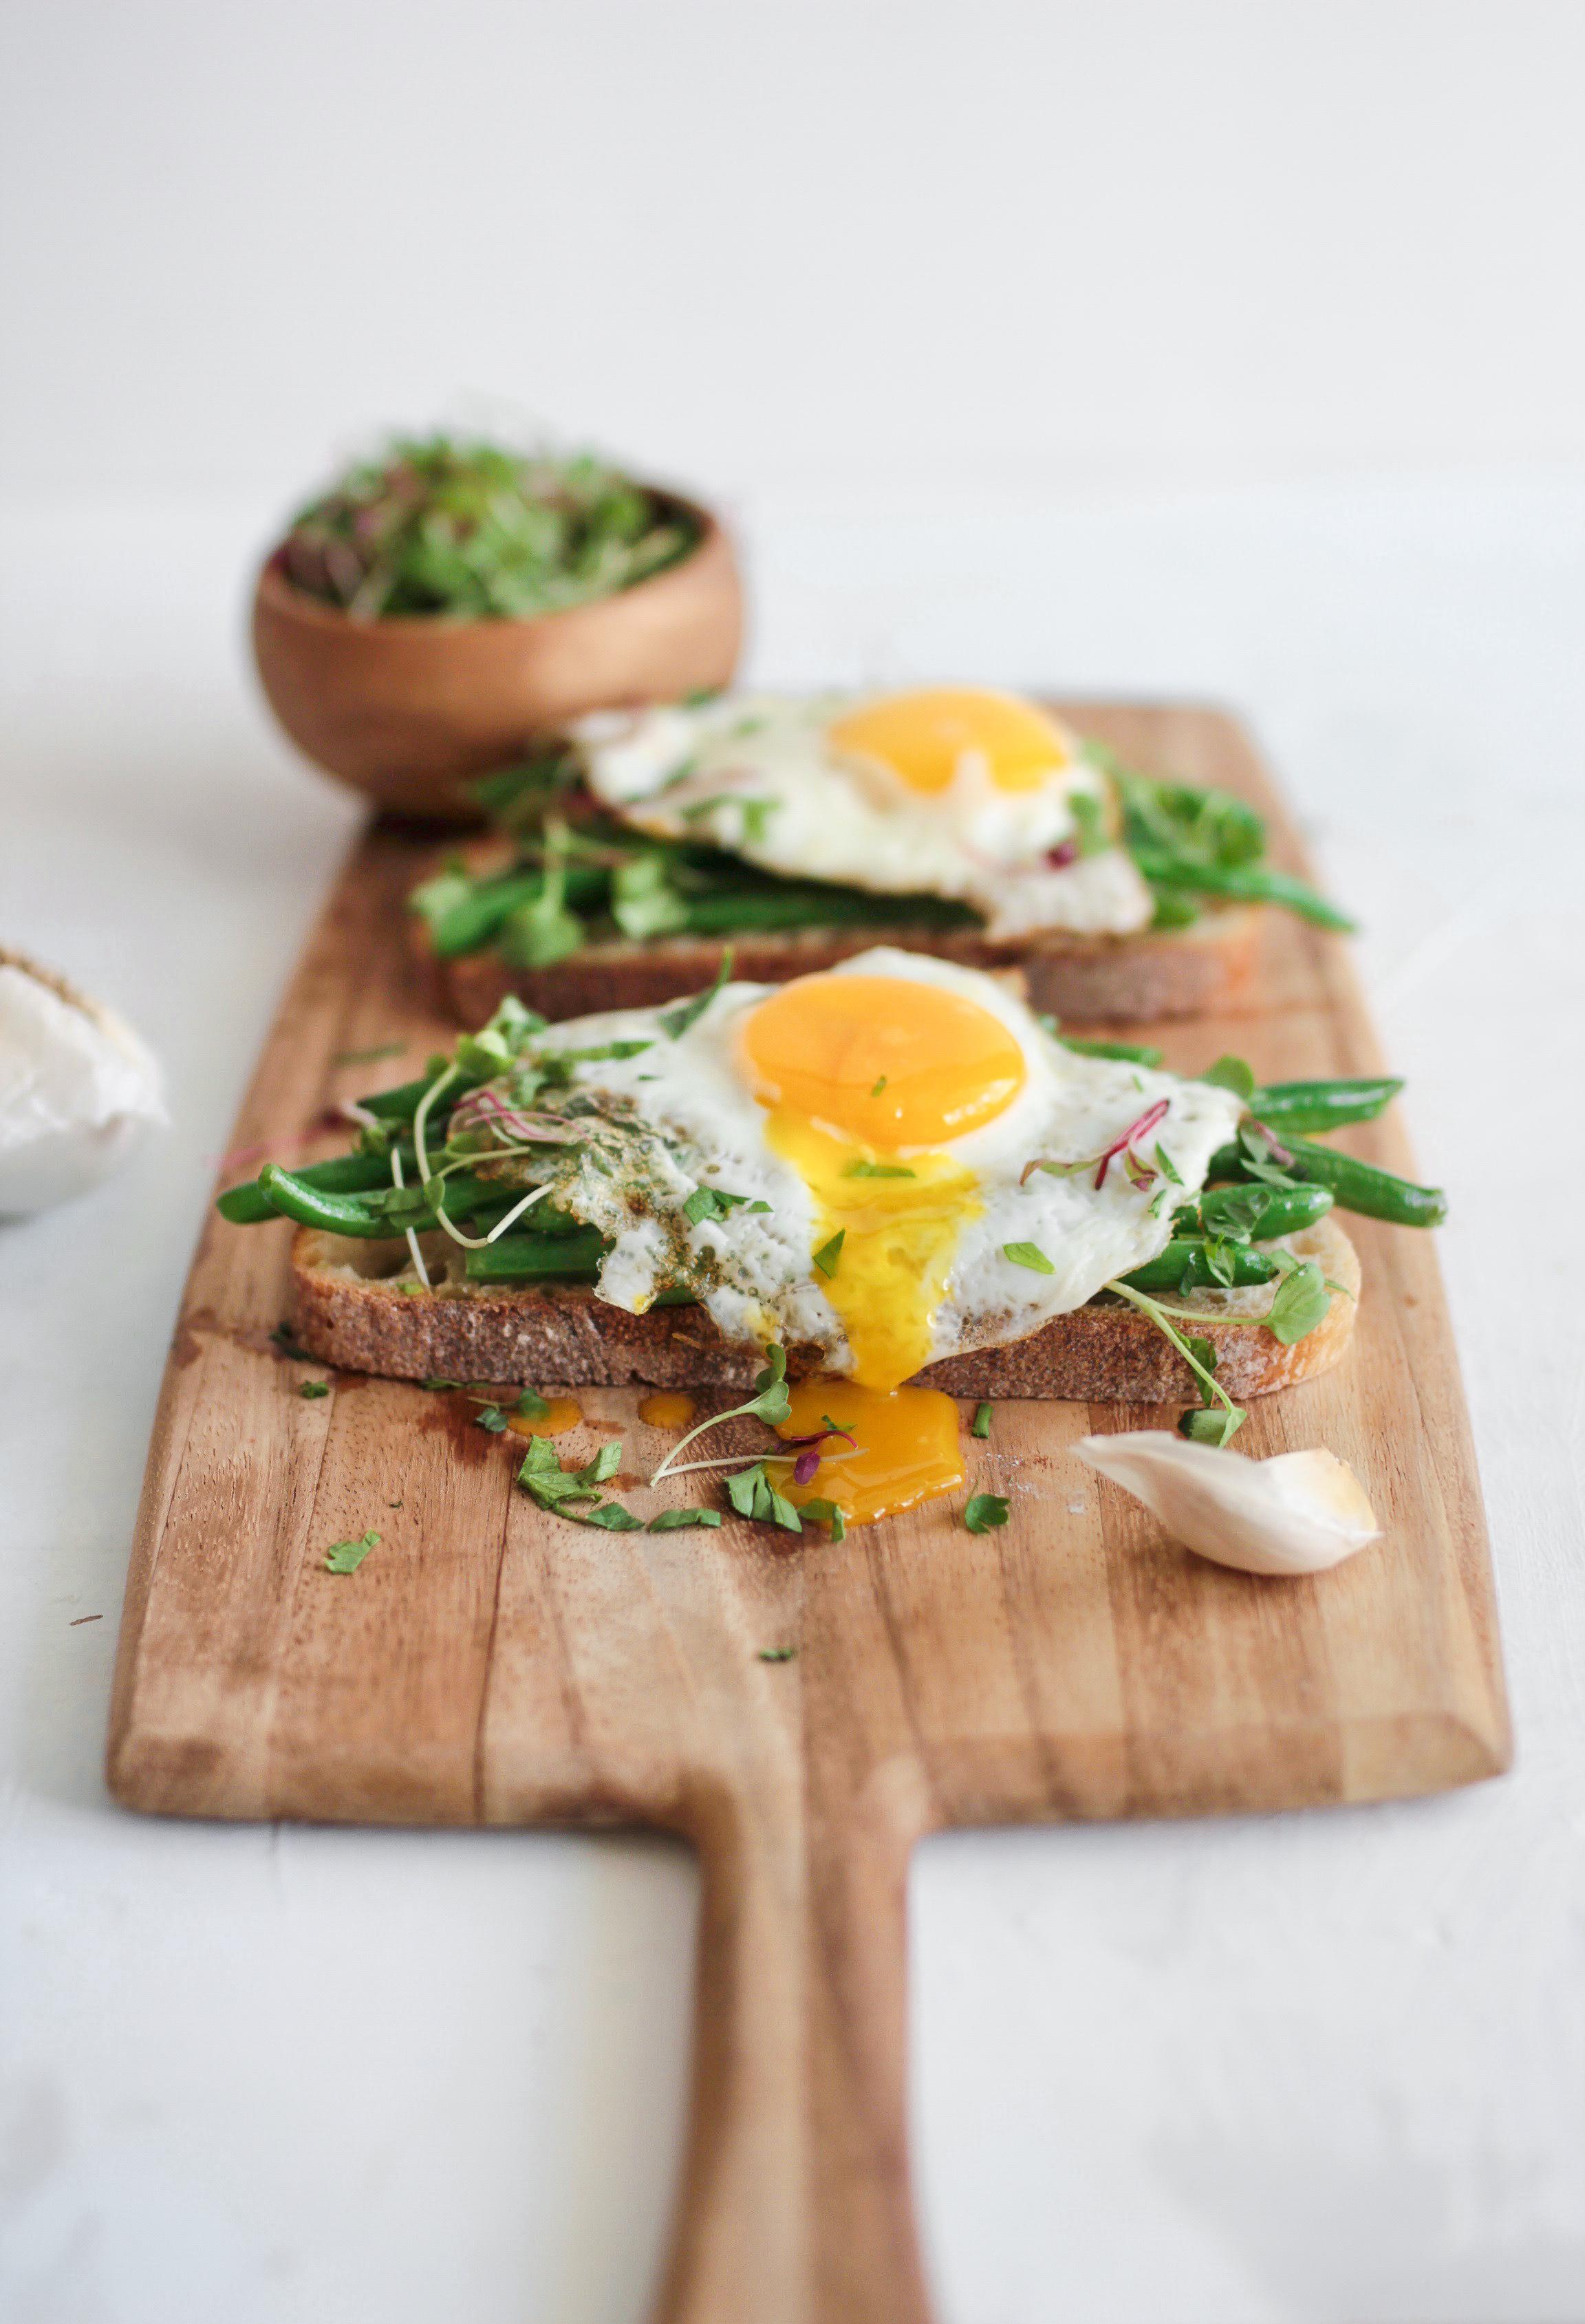 Best Brunch Vegetable Garlic Green Bean Toast with a Fried Egg